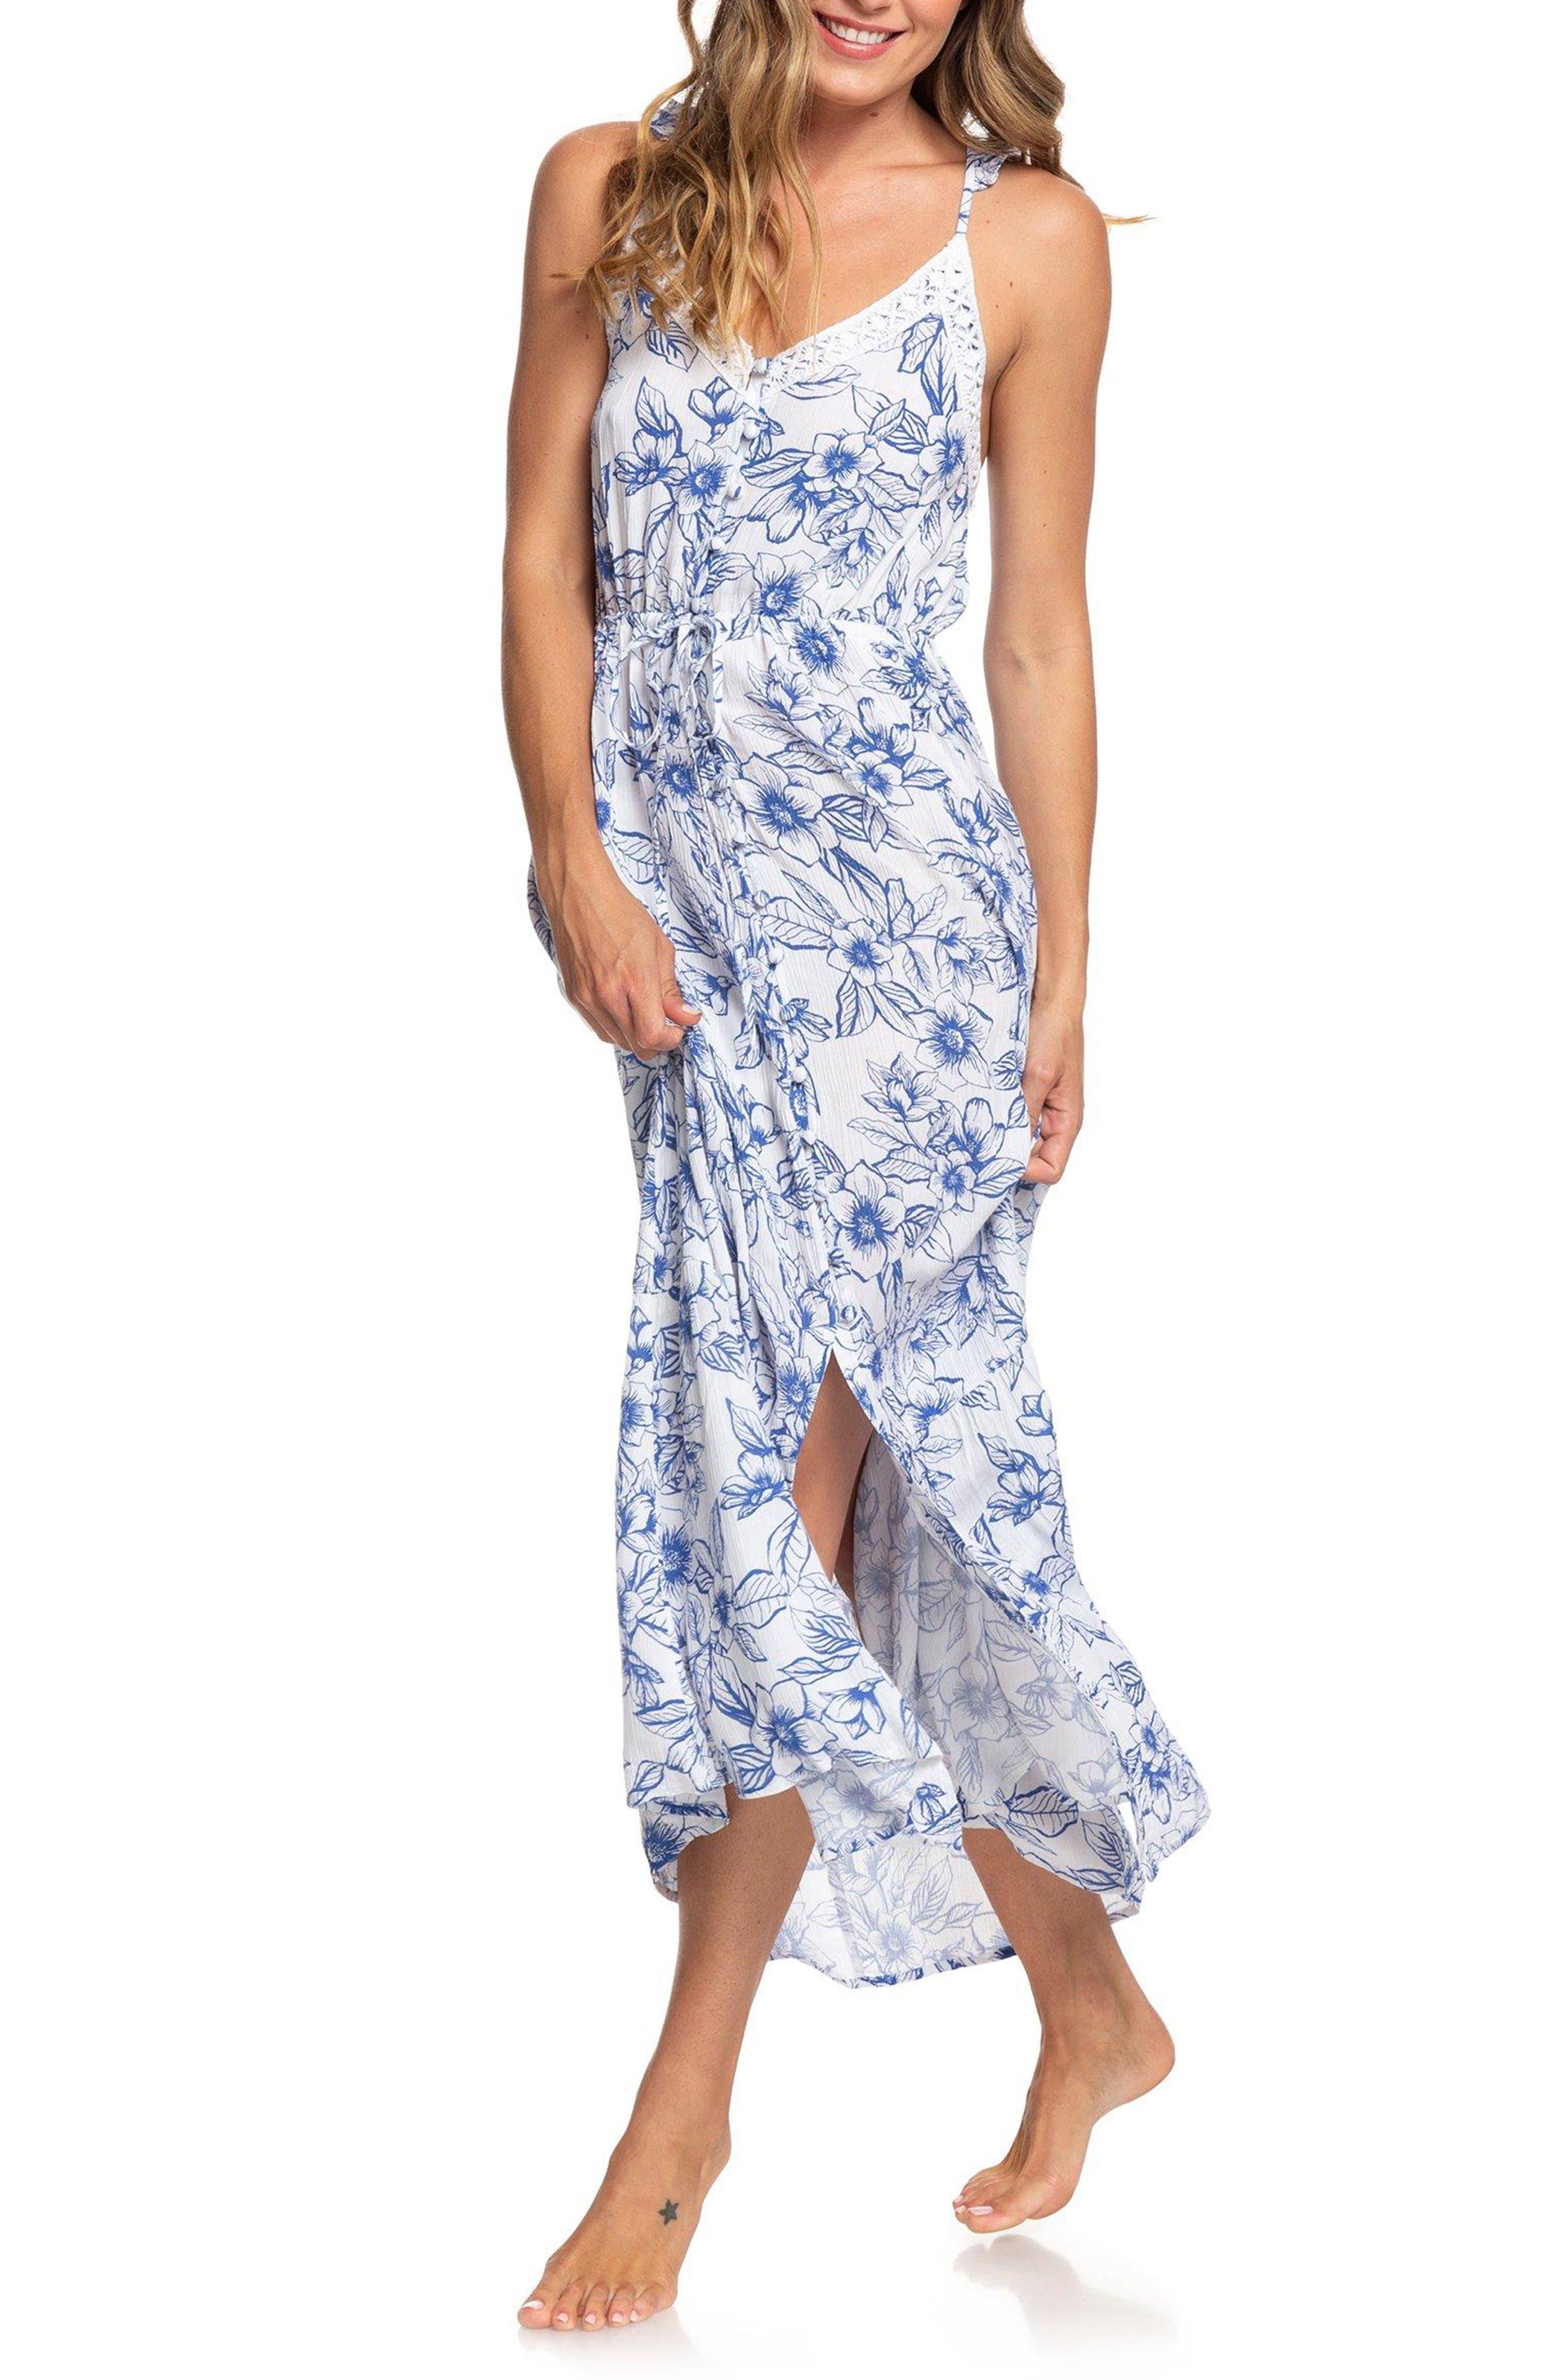 Roxy Hot Summer Lands Print Maxi Dress, White